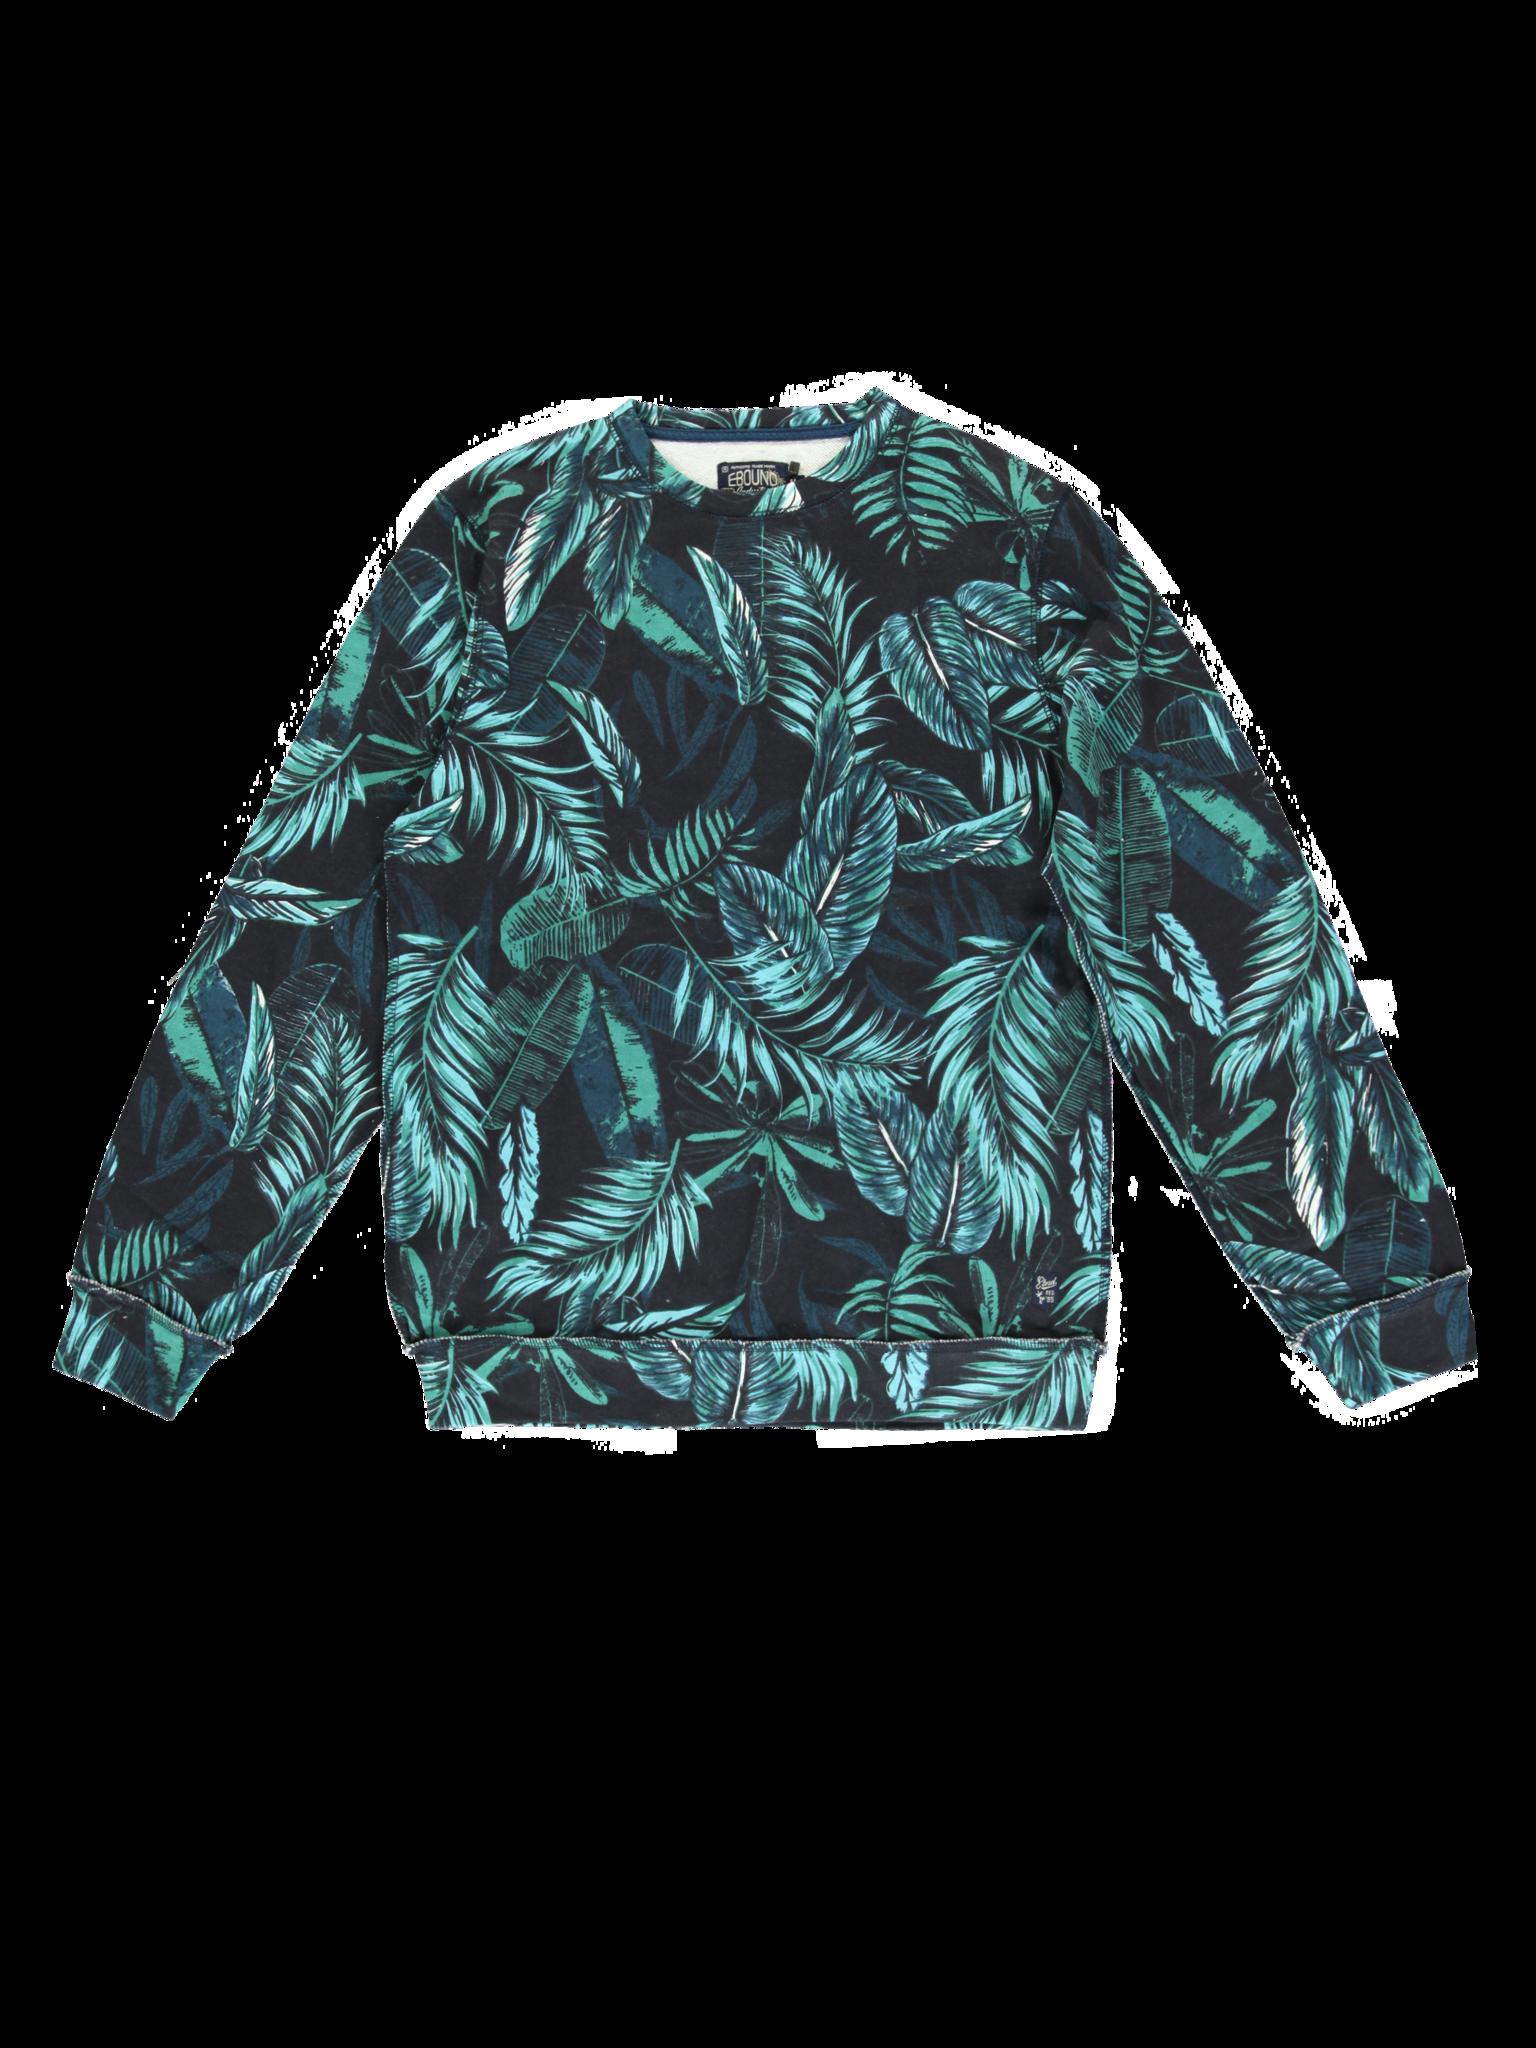 All Brands | Summerproducts Men | Sweatshirt | 18 pcs/box